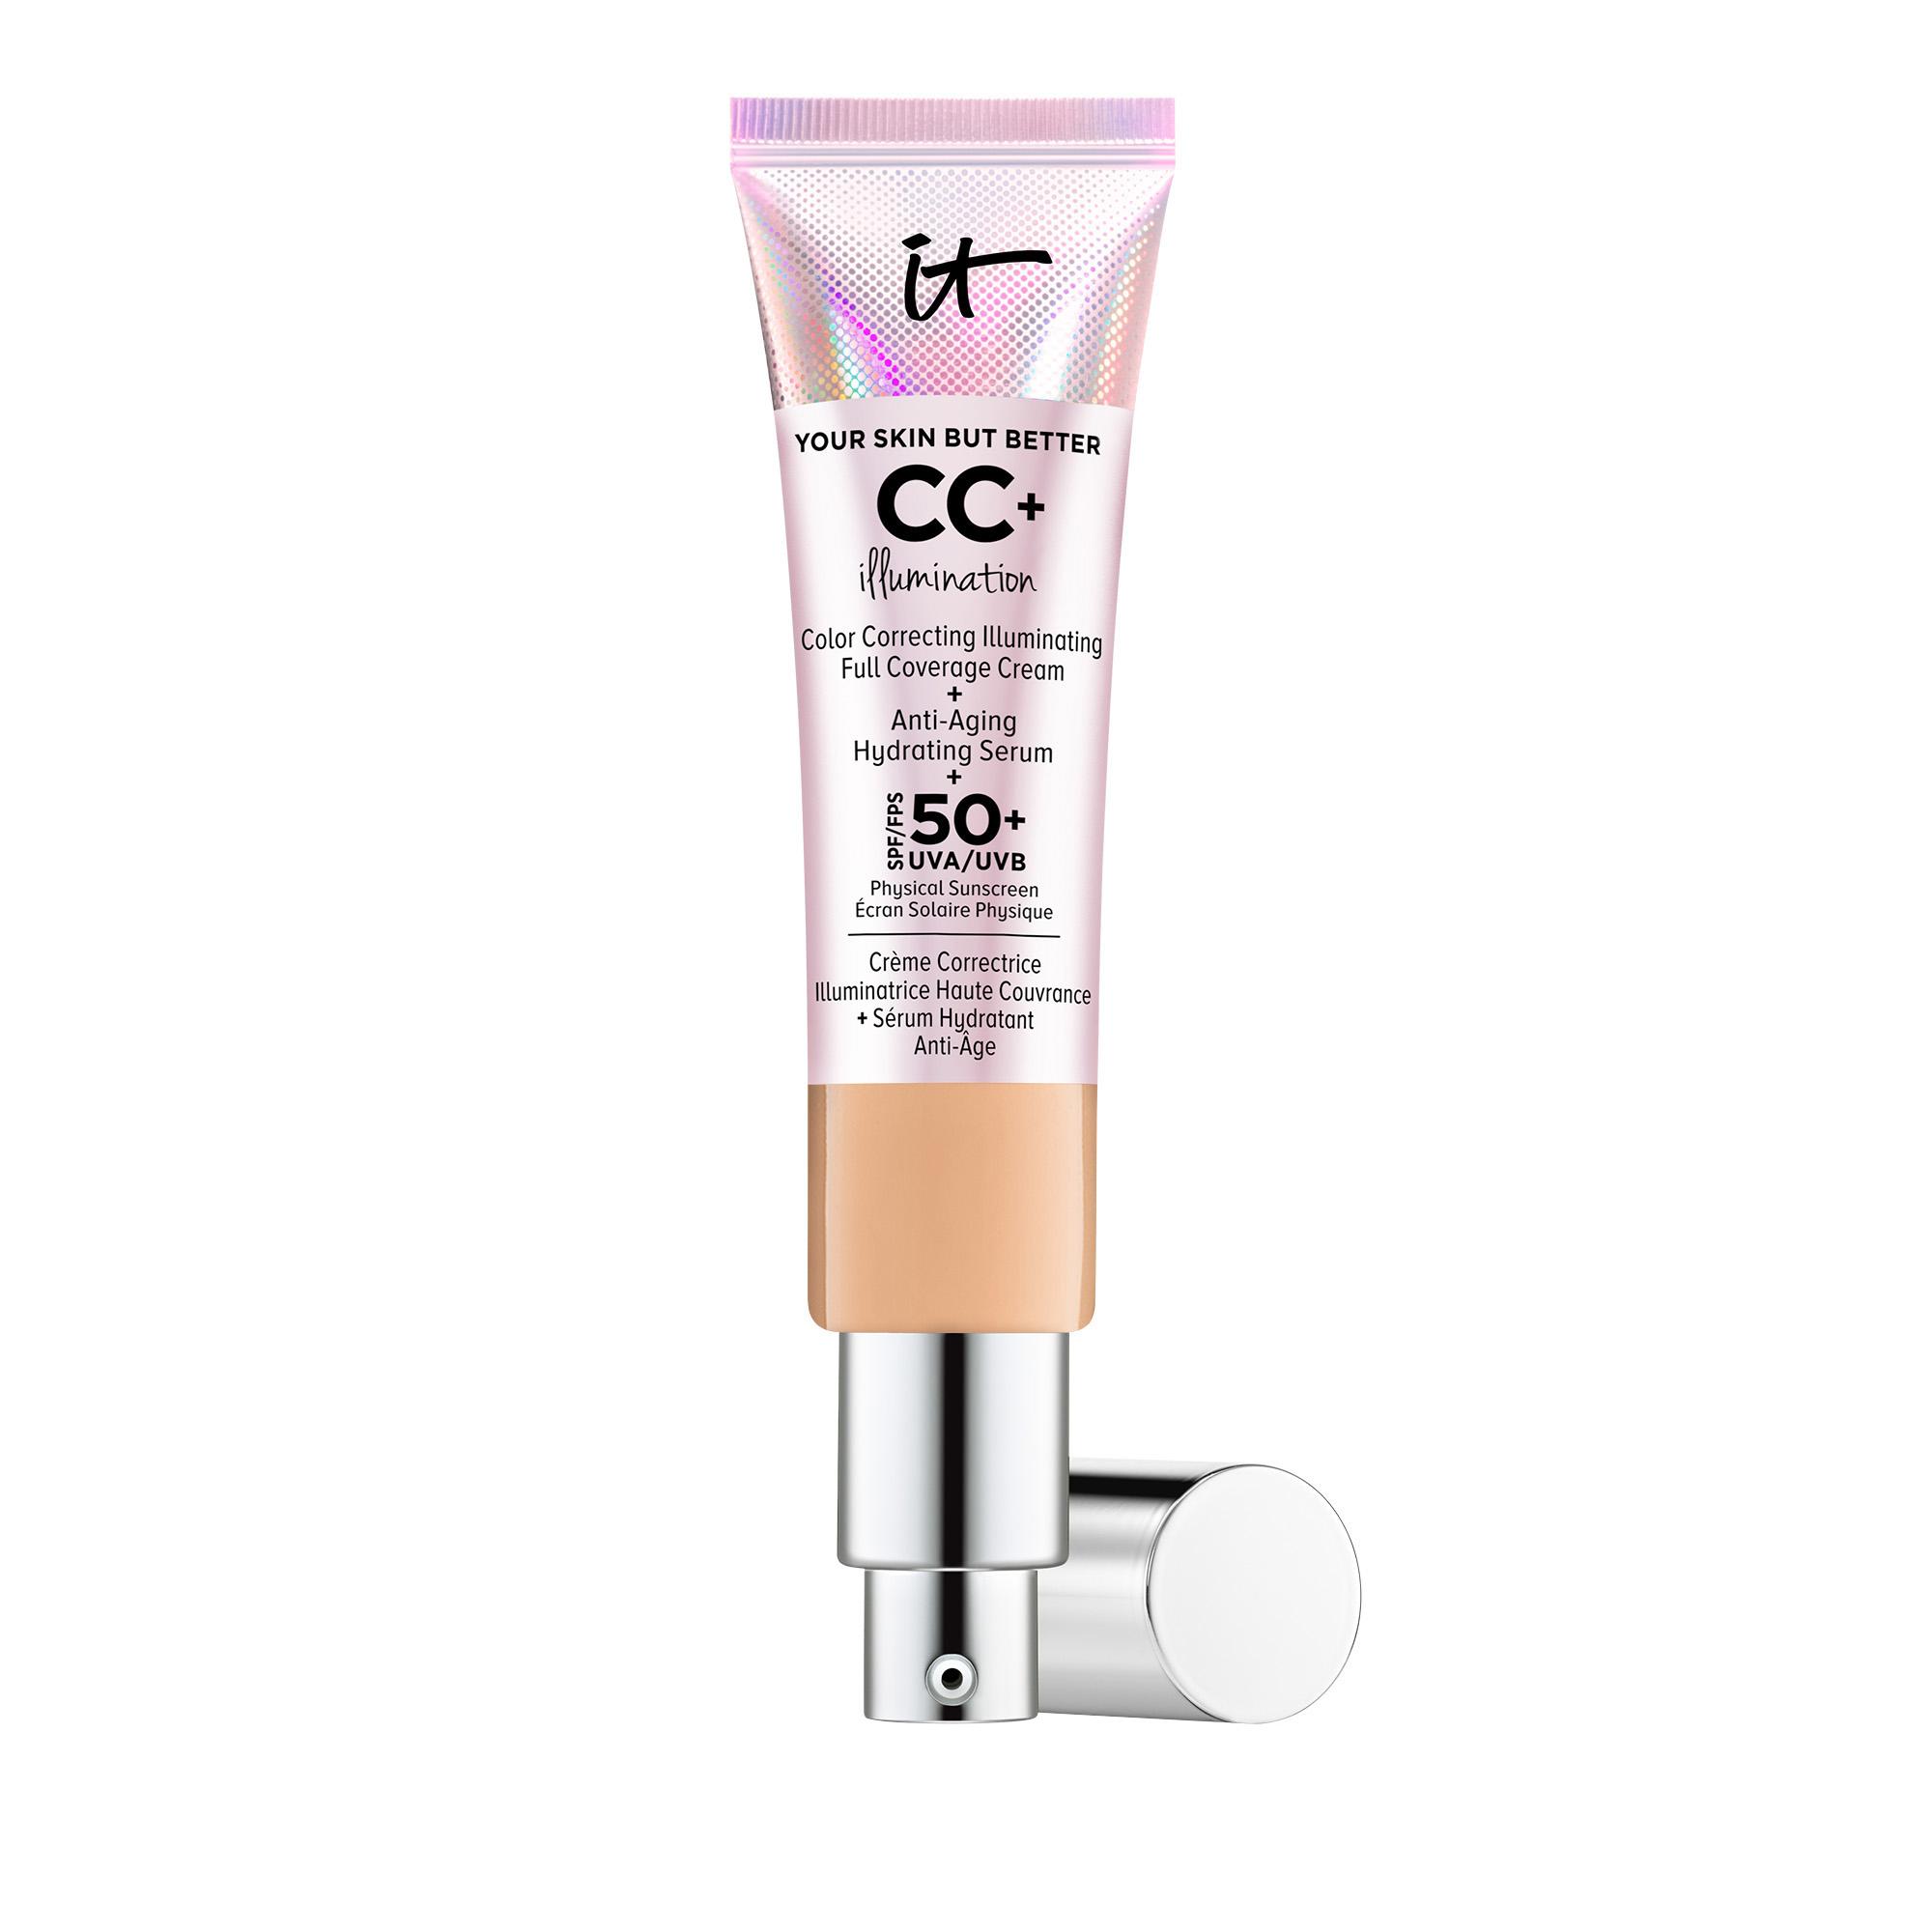 Your Skin But Better™ CC+ Illumination™ SPF 50+ Medium Tan